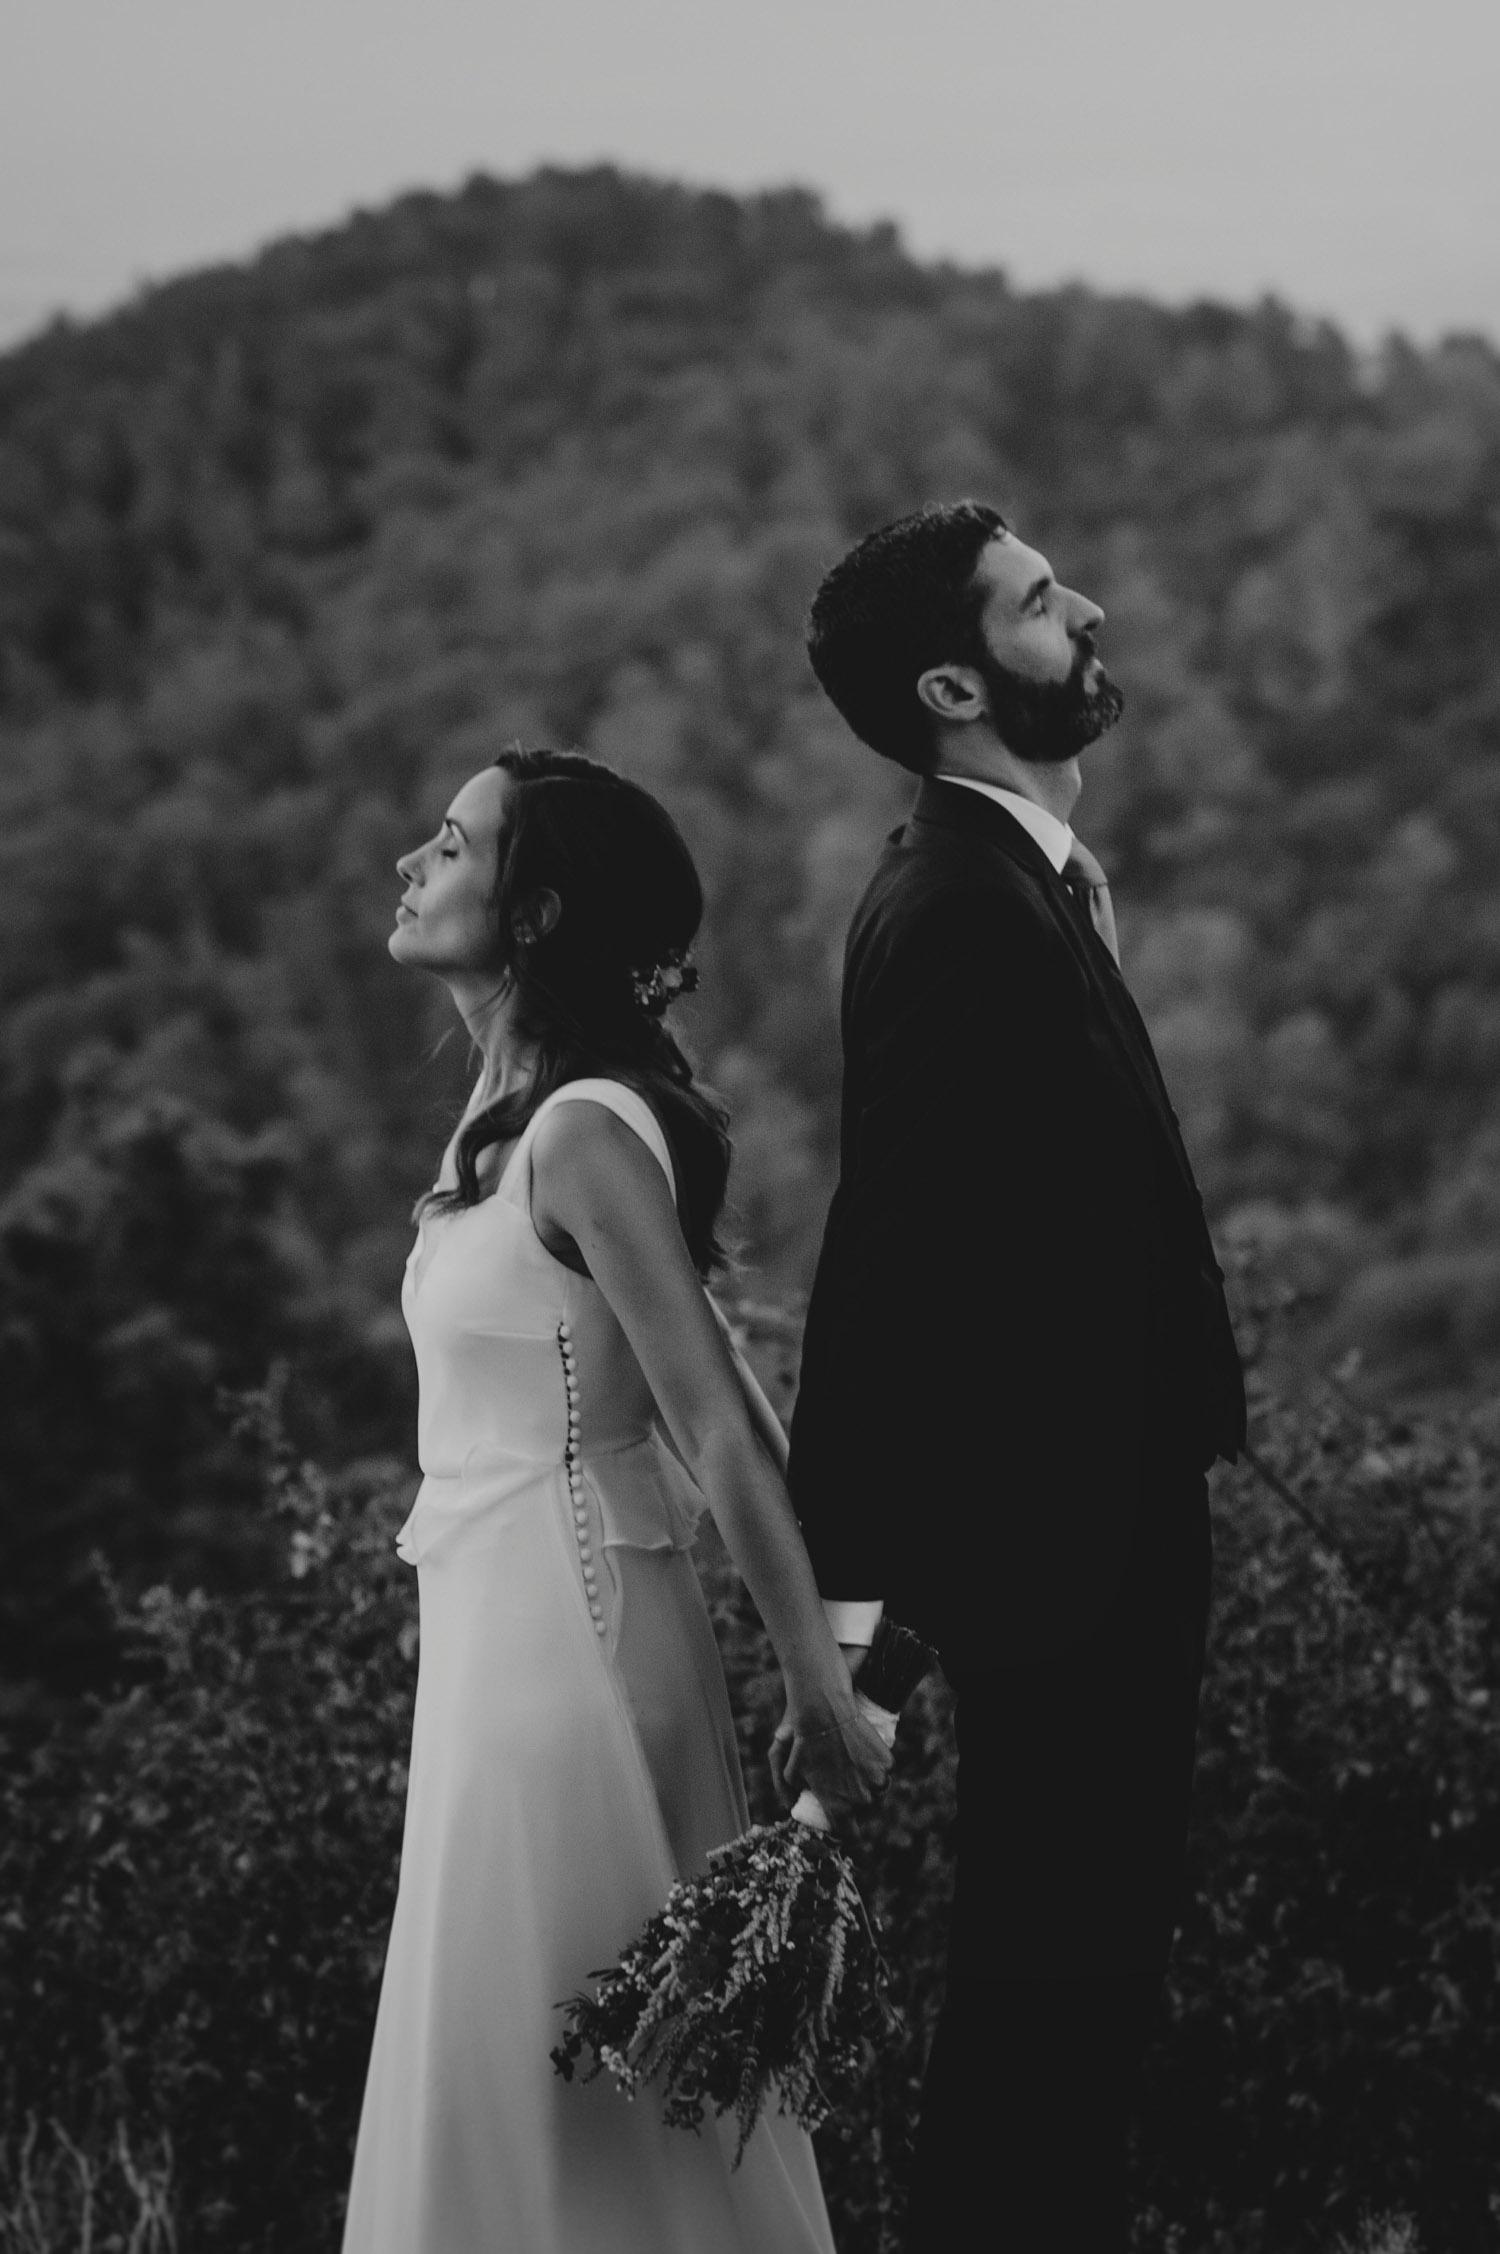 boda natural en la naturaleza